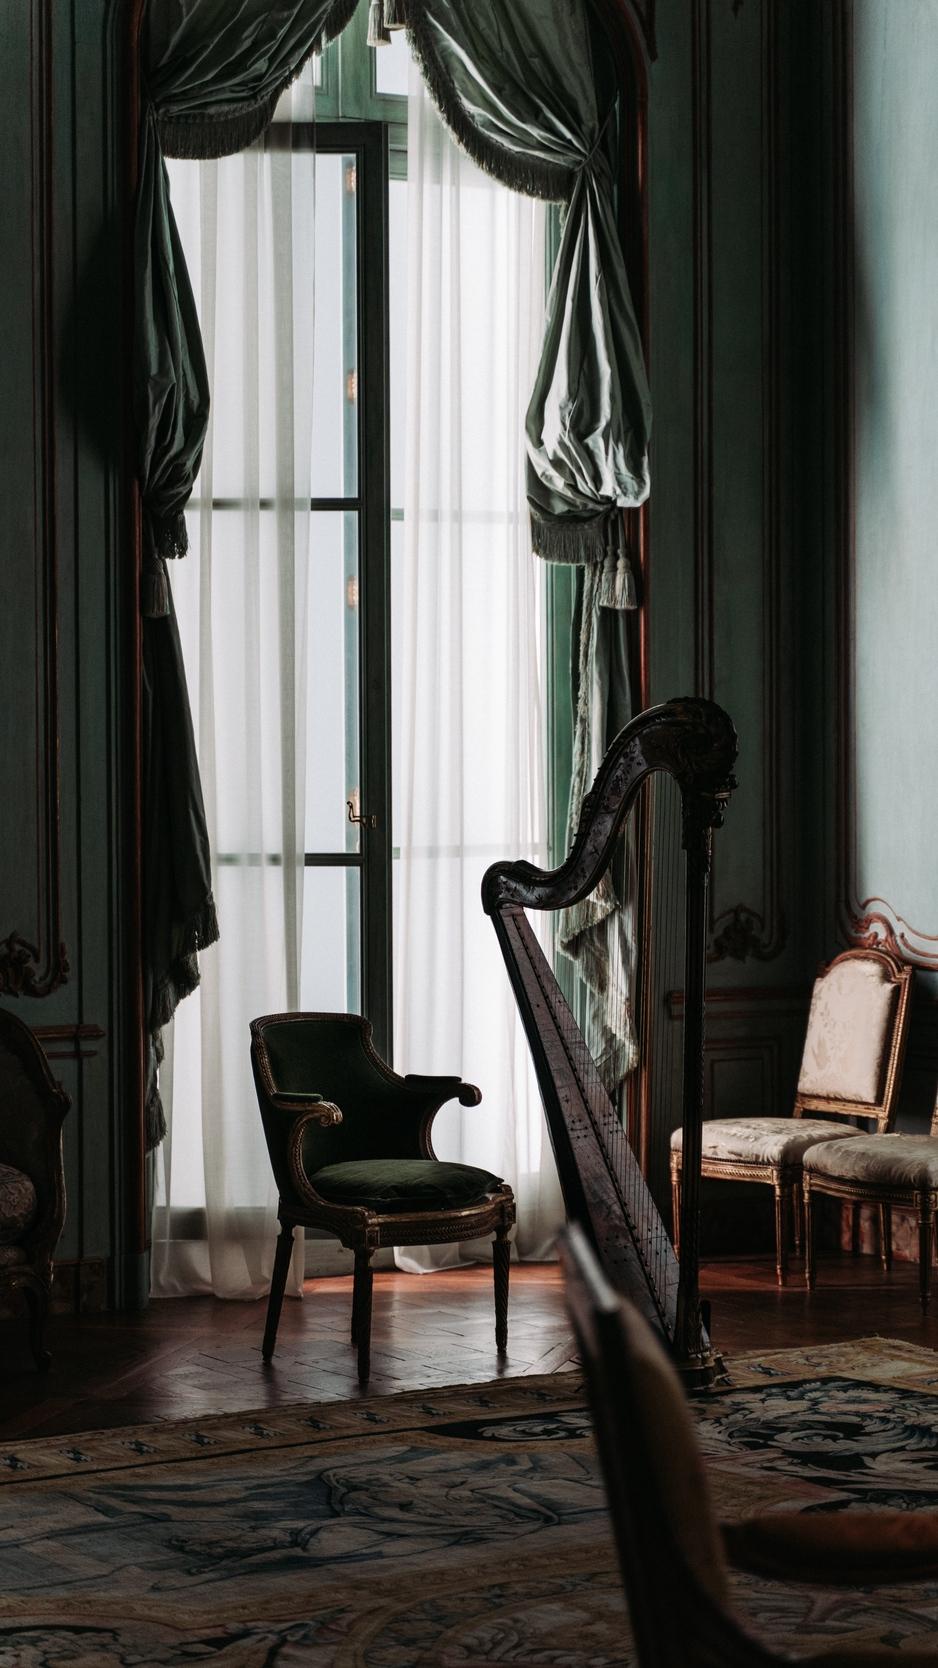 Download wallpaper 938x1668 room interior furniture harp 938x1668